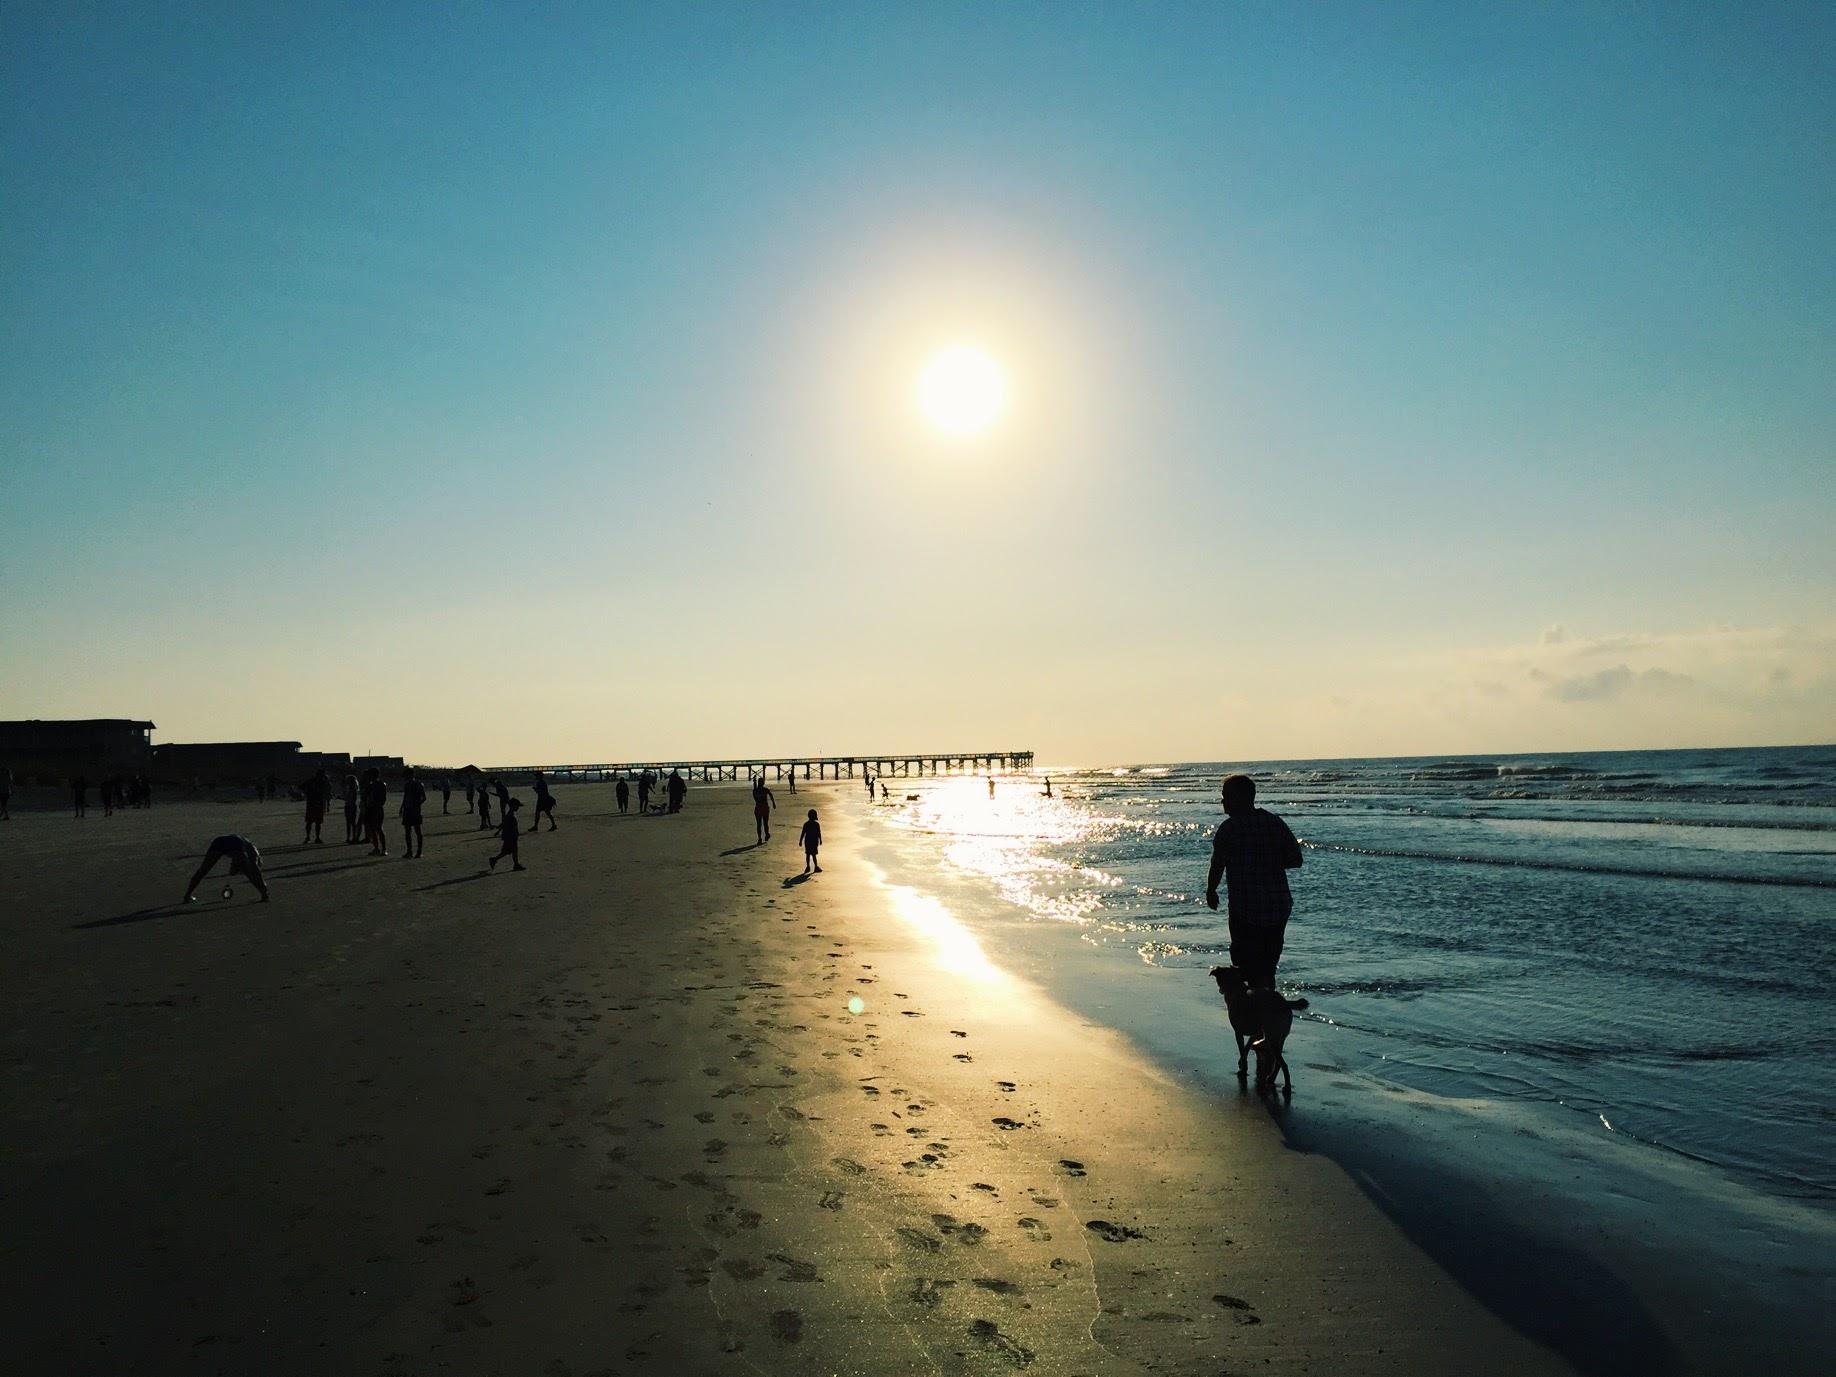 isle-of-palms-beach